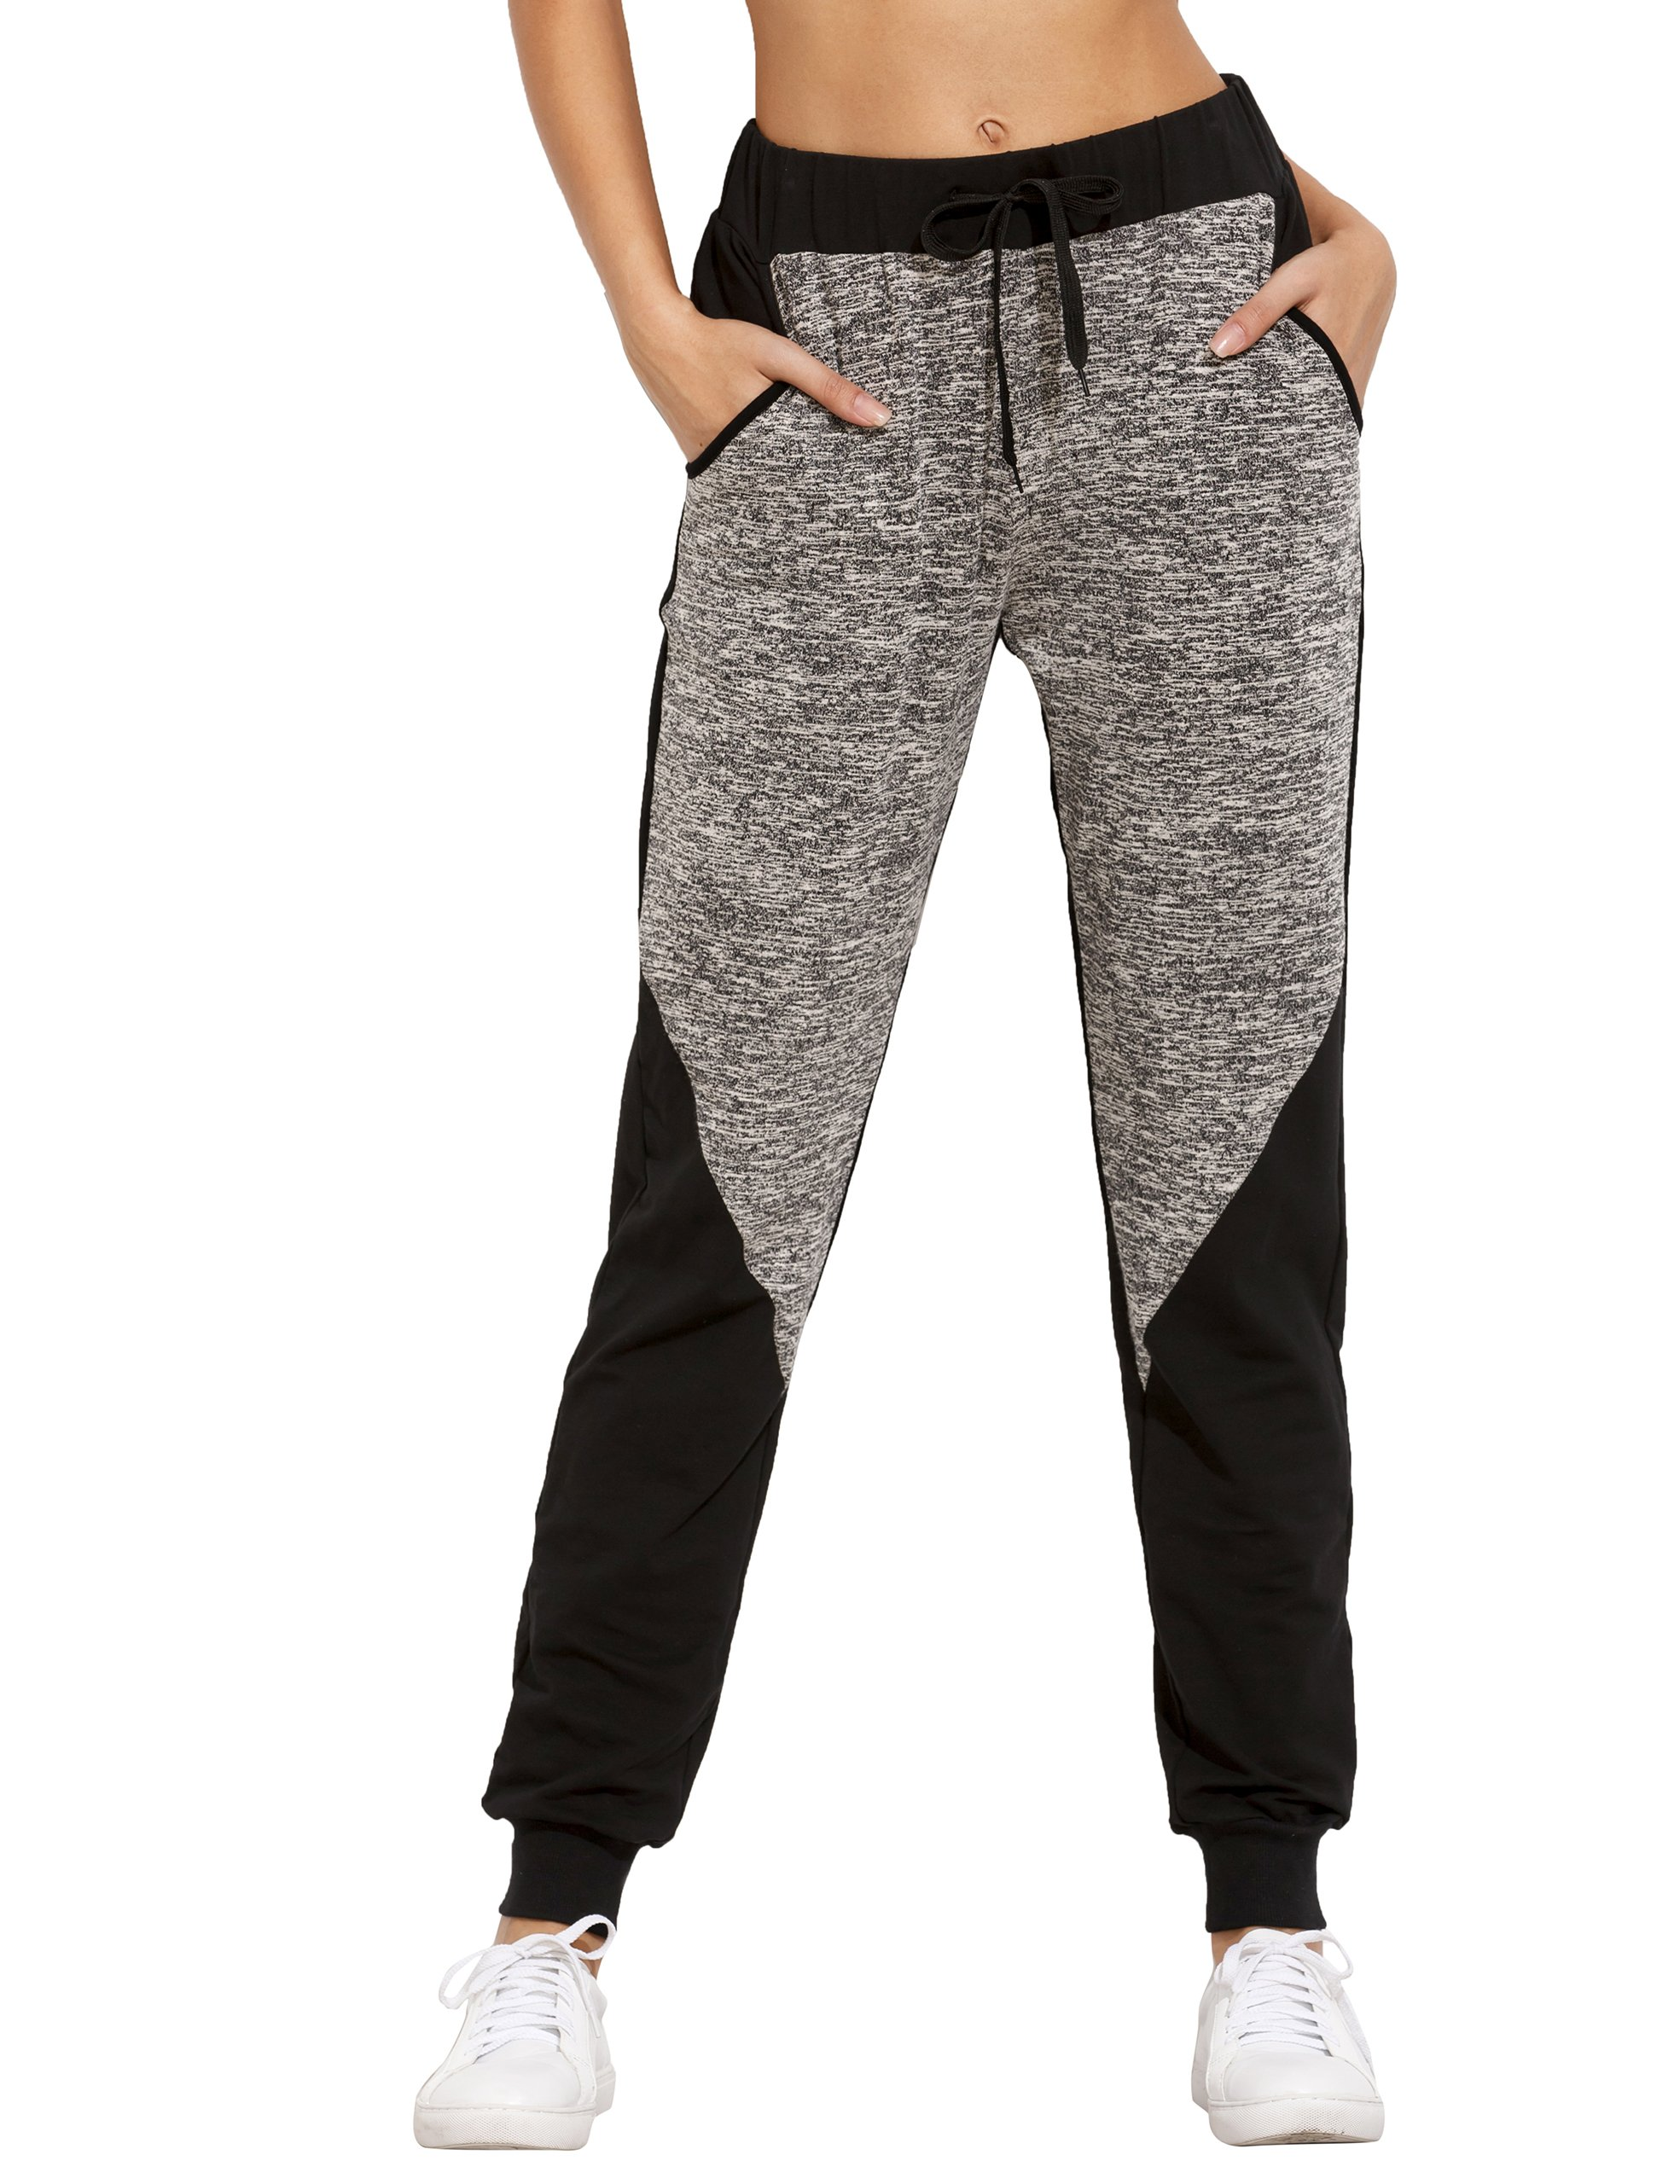 SweatyRocks Women Pants Colorblock Casual Tie Waist Yoga Jogger Pants, Black Grey Colorblock, Medium